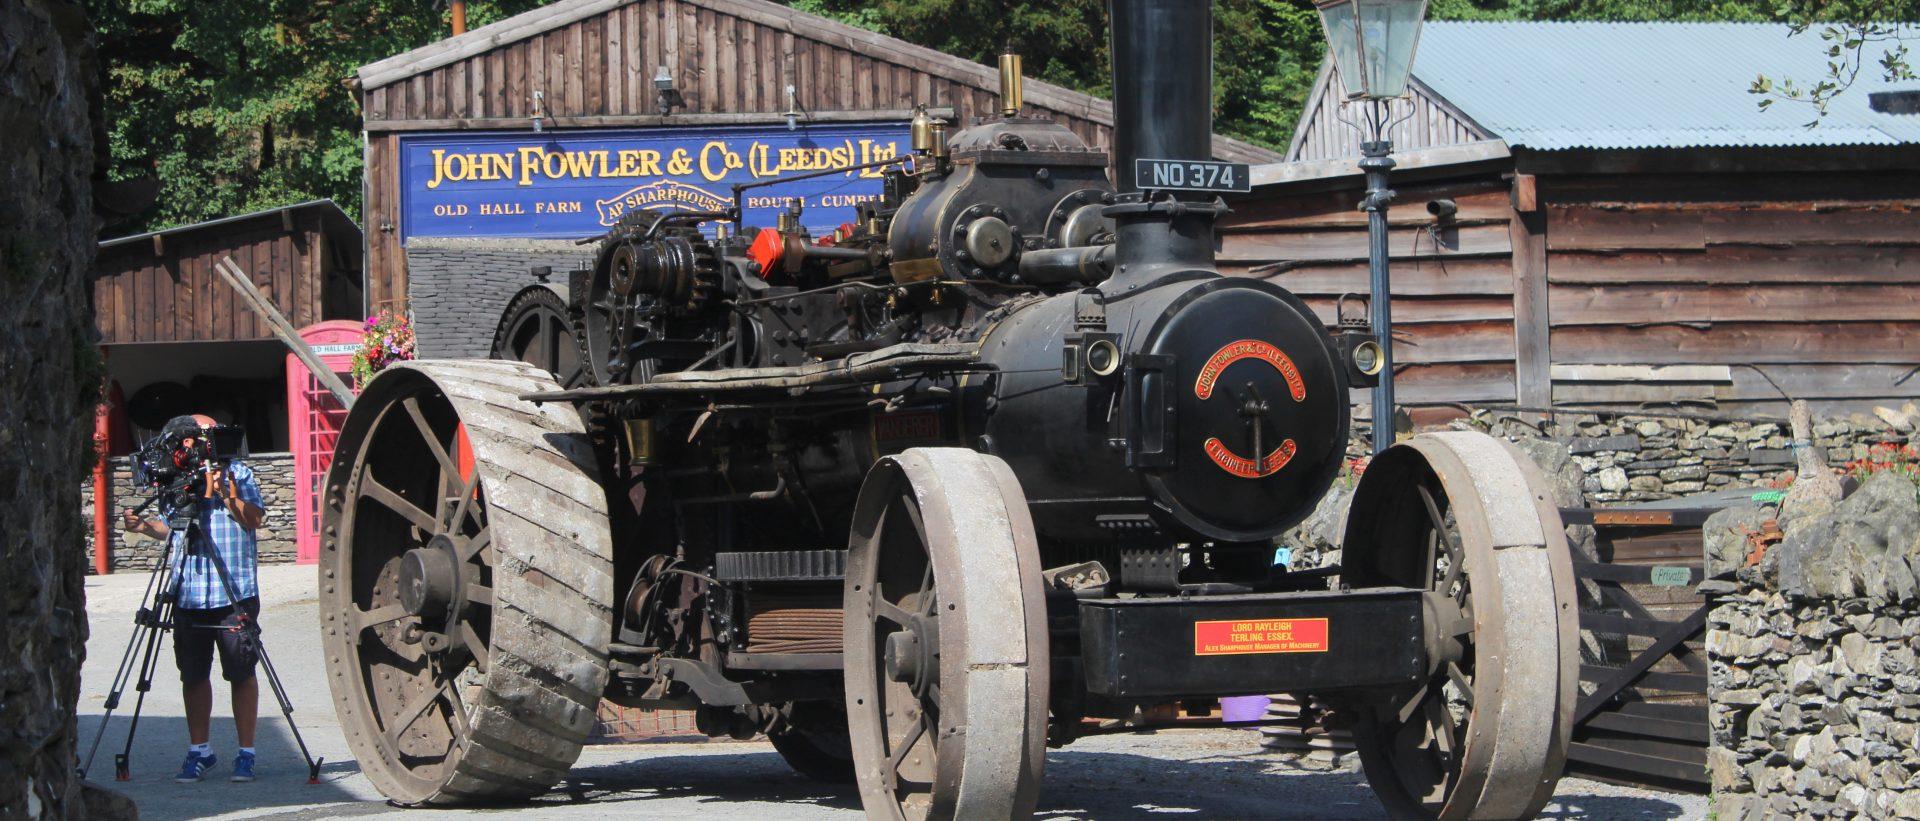 Cumbria Steam & Vintage Vehicle Society